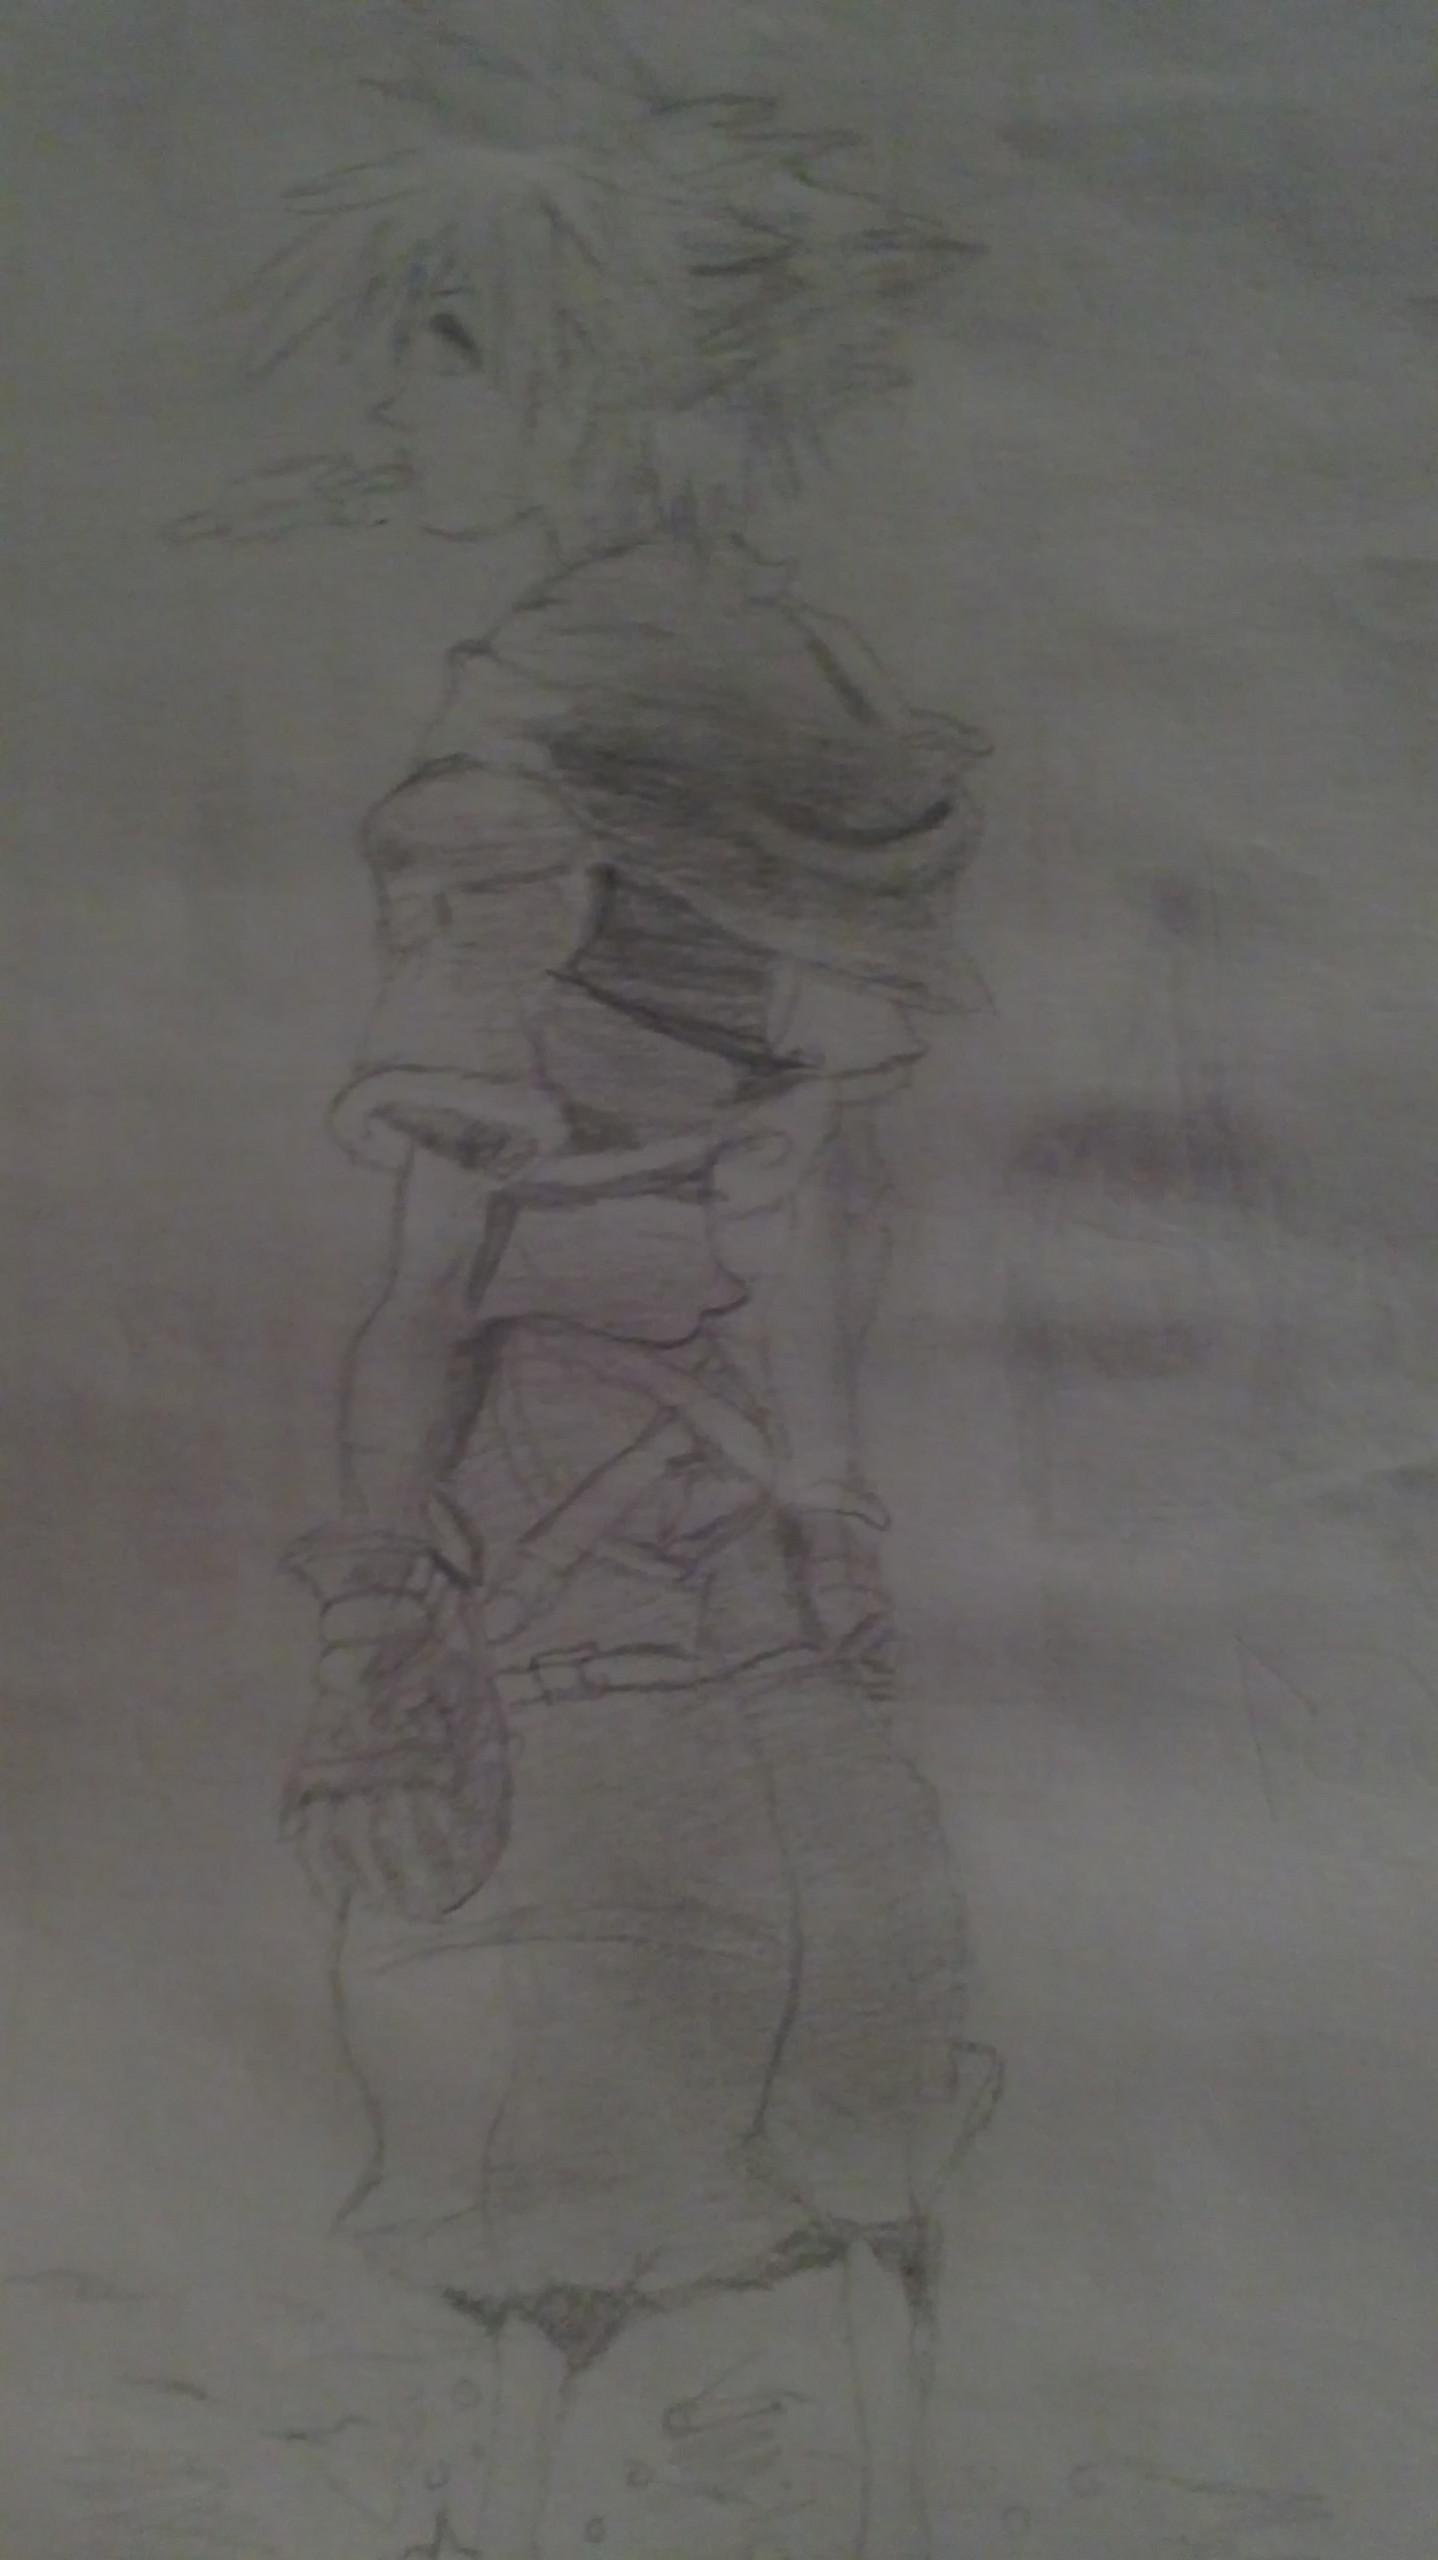 Kingdom Hearts Bilder My Drawing Of Sora Hd Hintergrund And